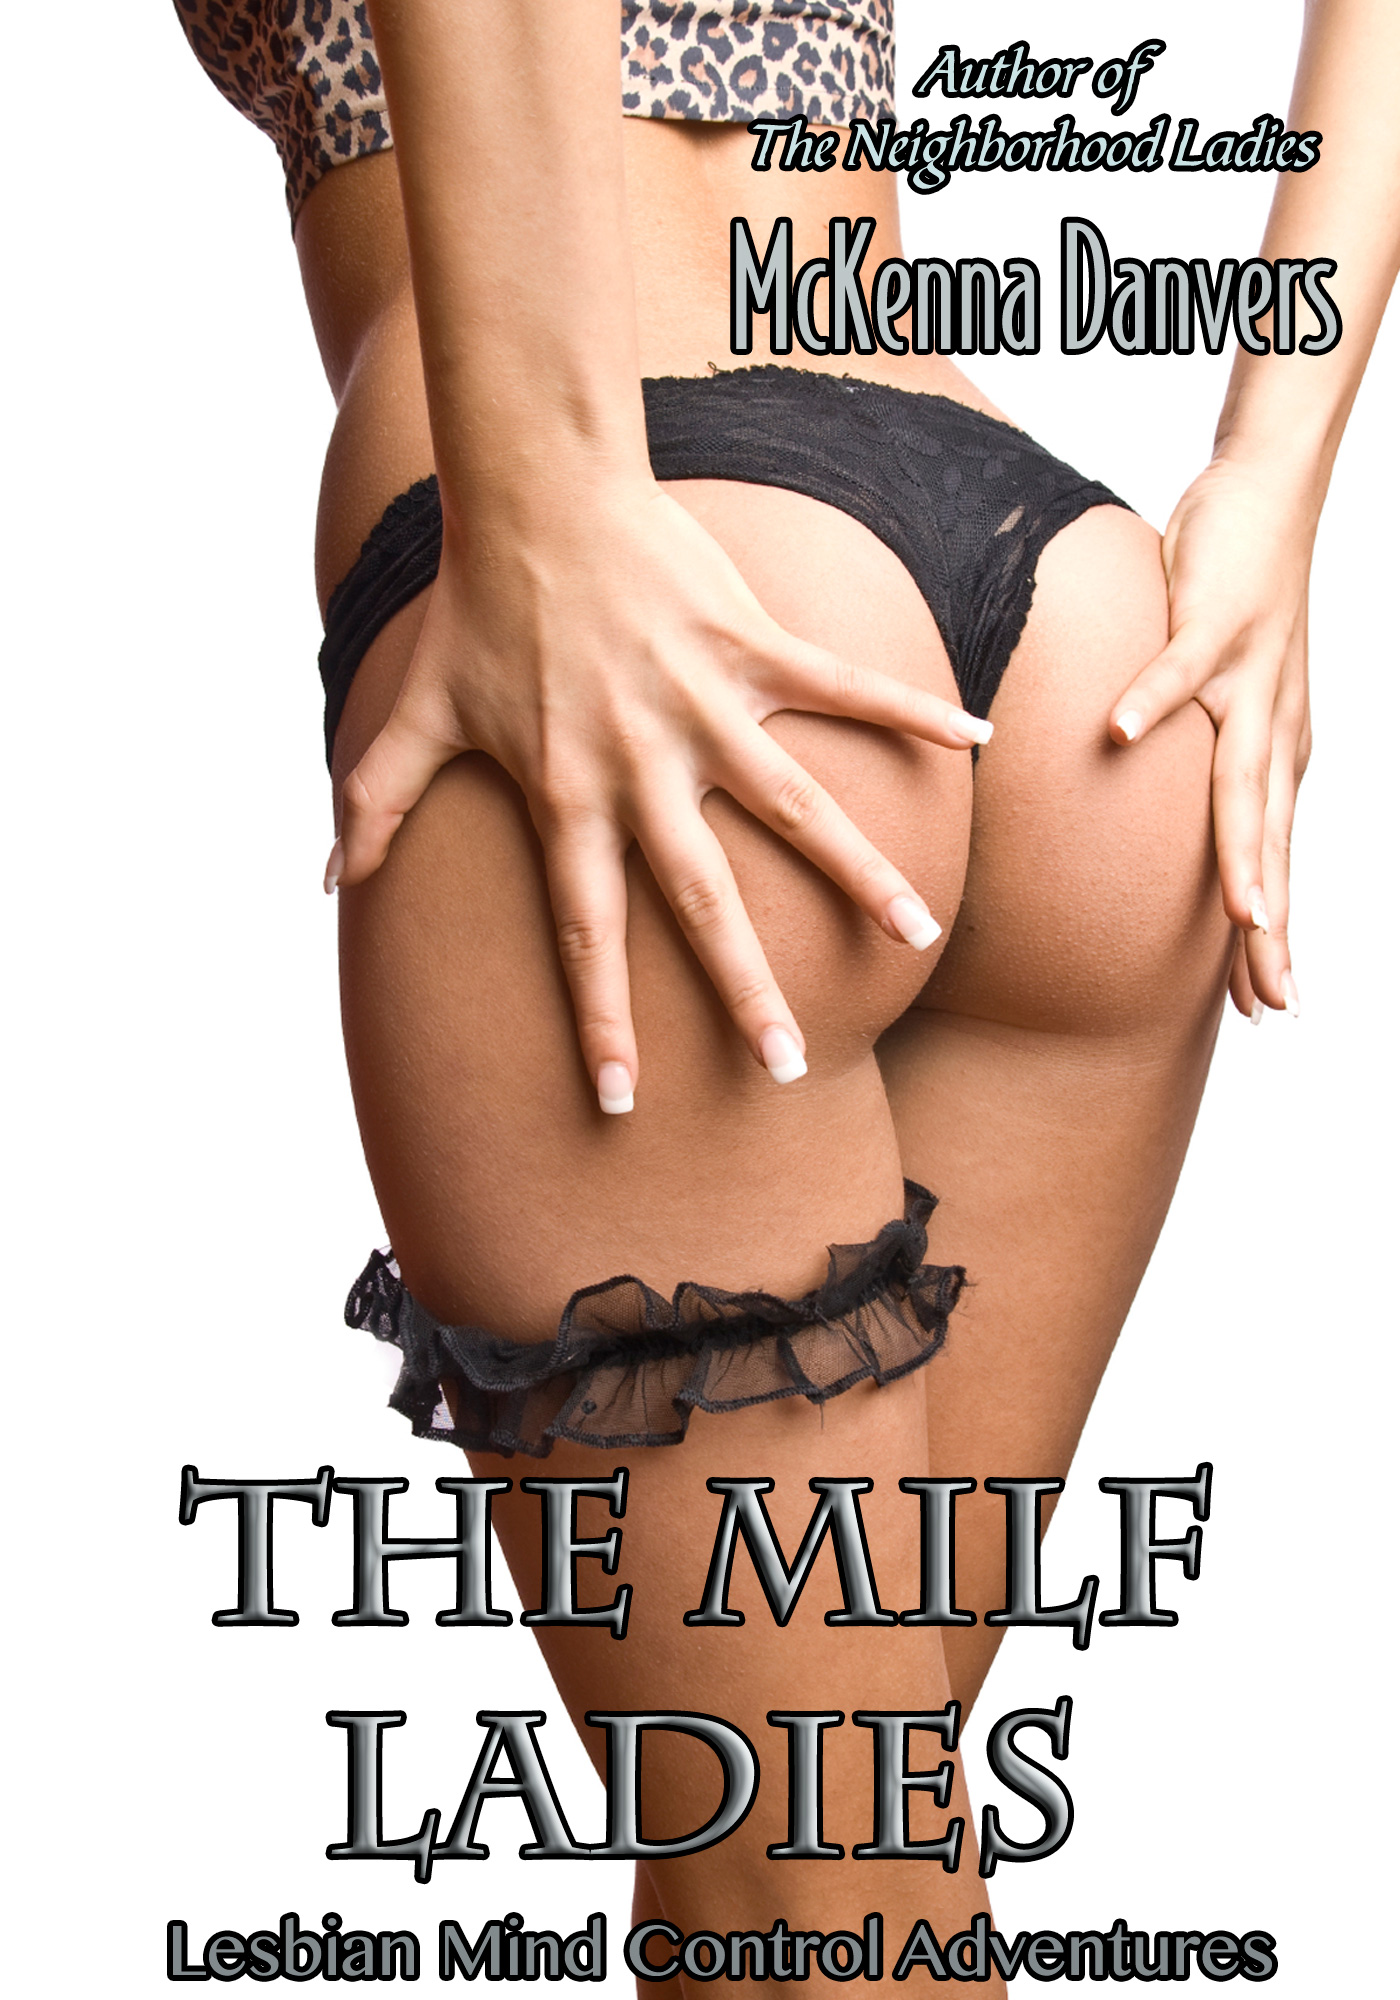 Milf and lesbian thumbs